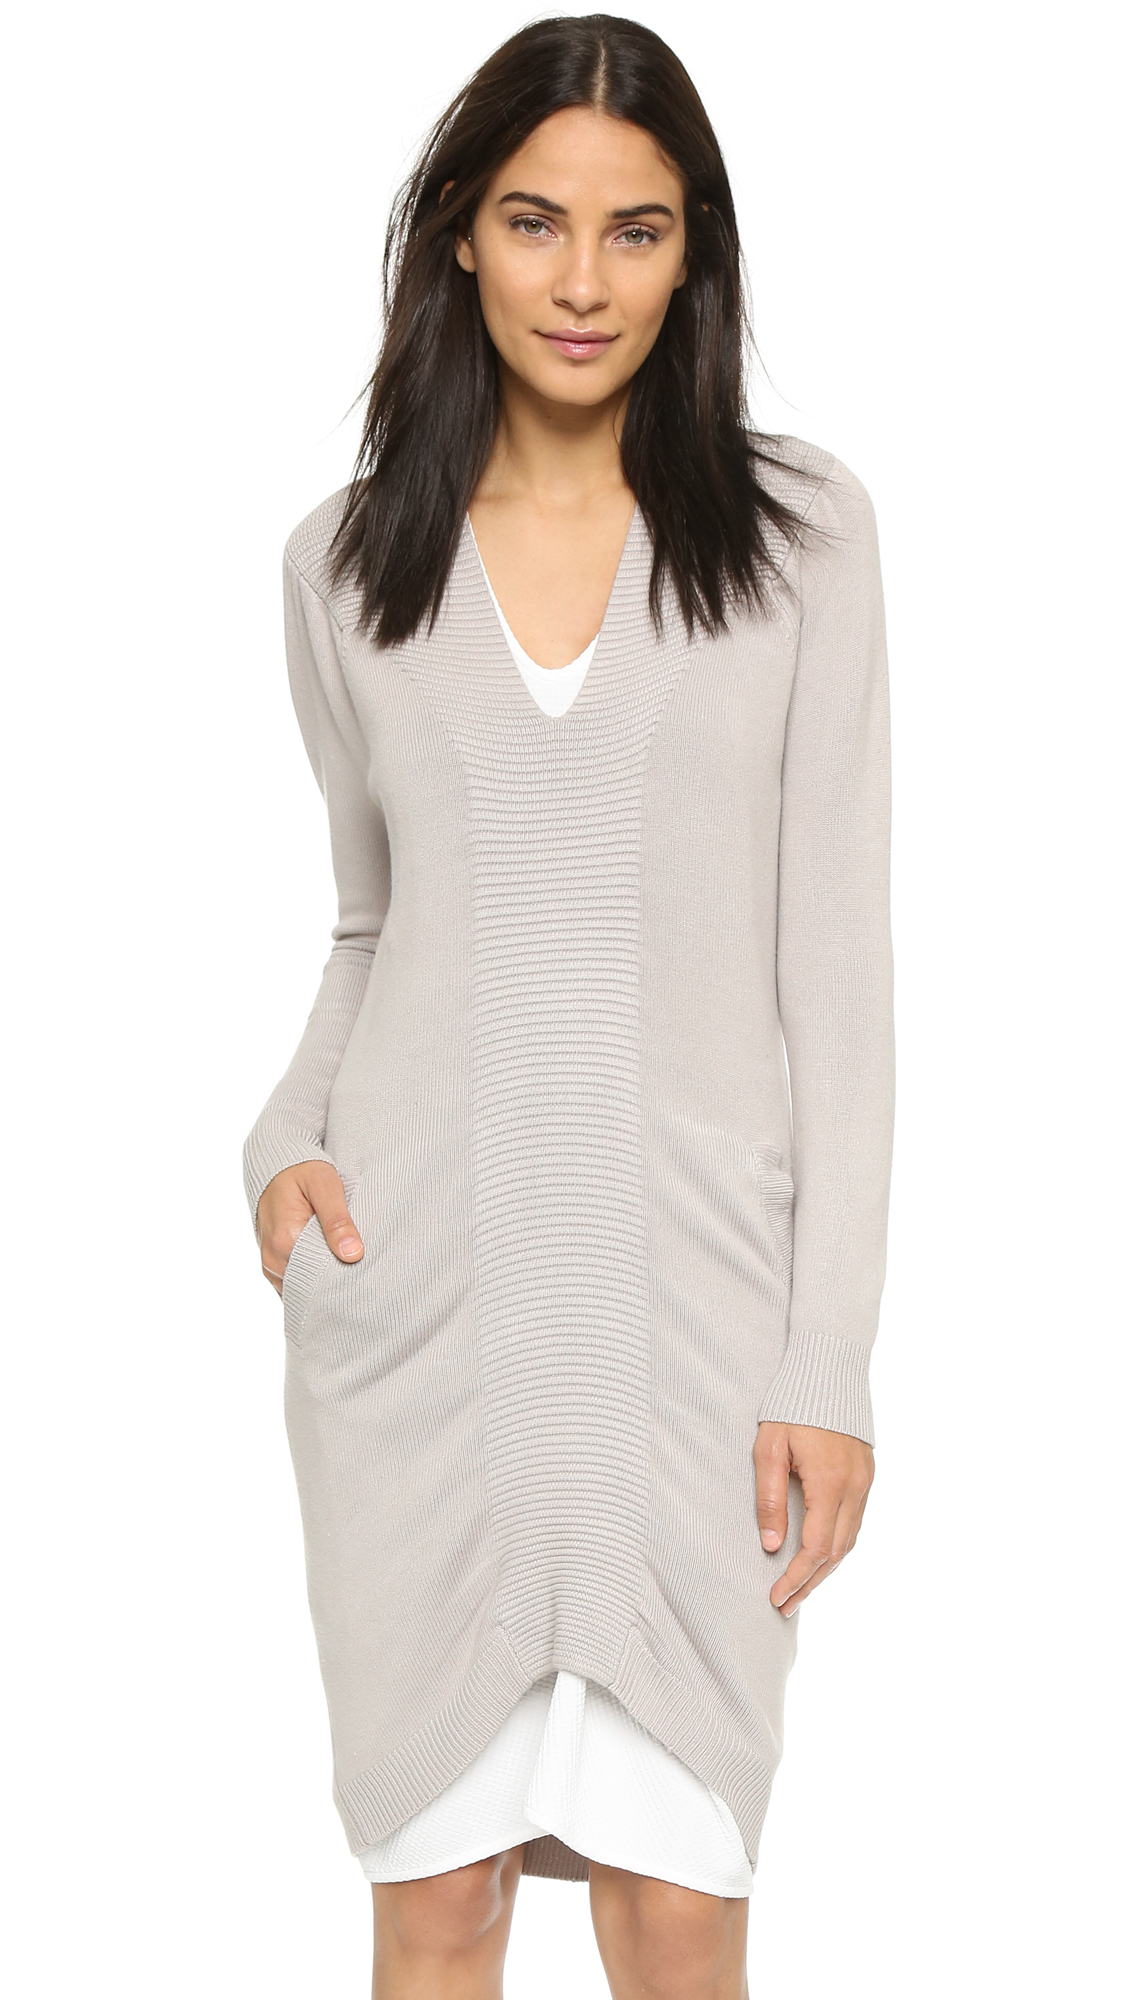 Zero + maria cornejo Quinn Sweater Dress - Oatmeal in Natural   Lyst